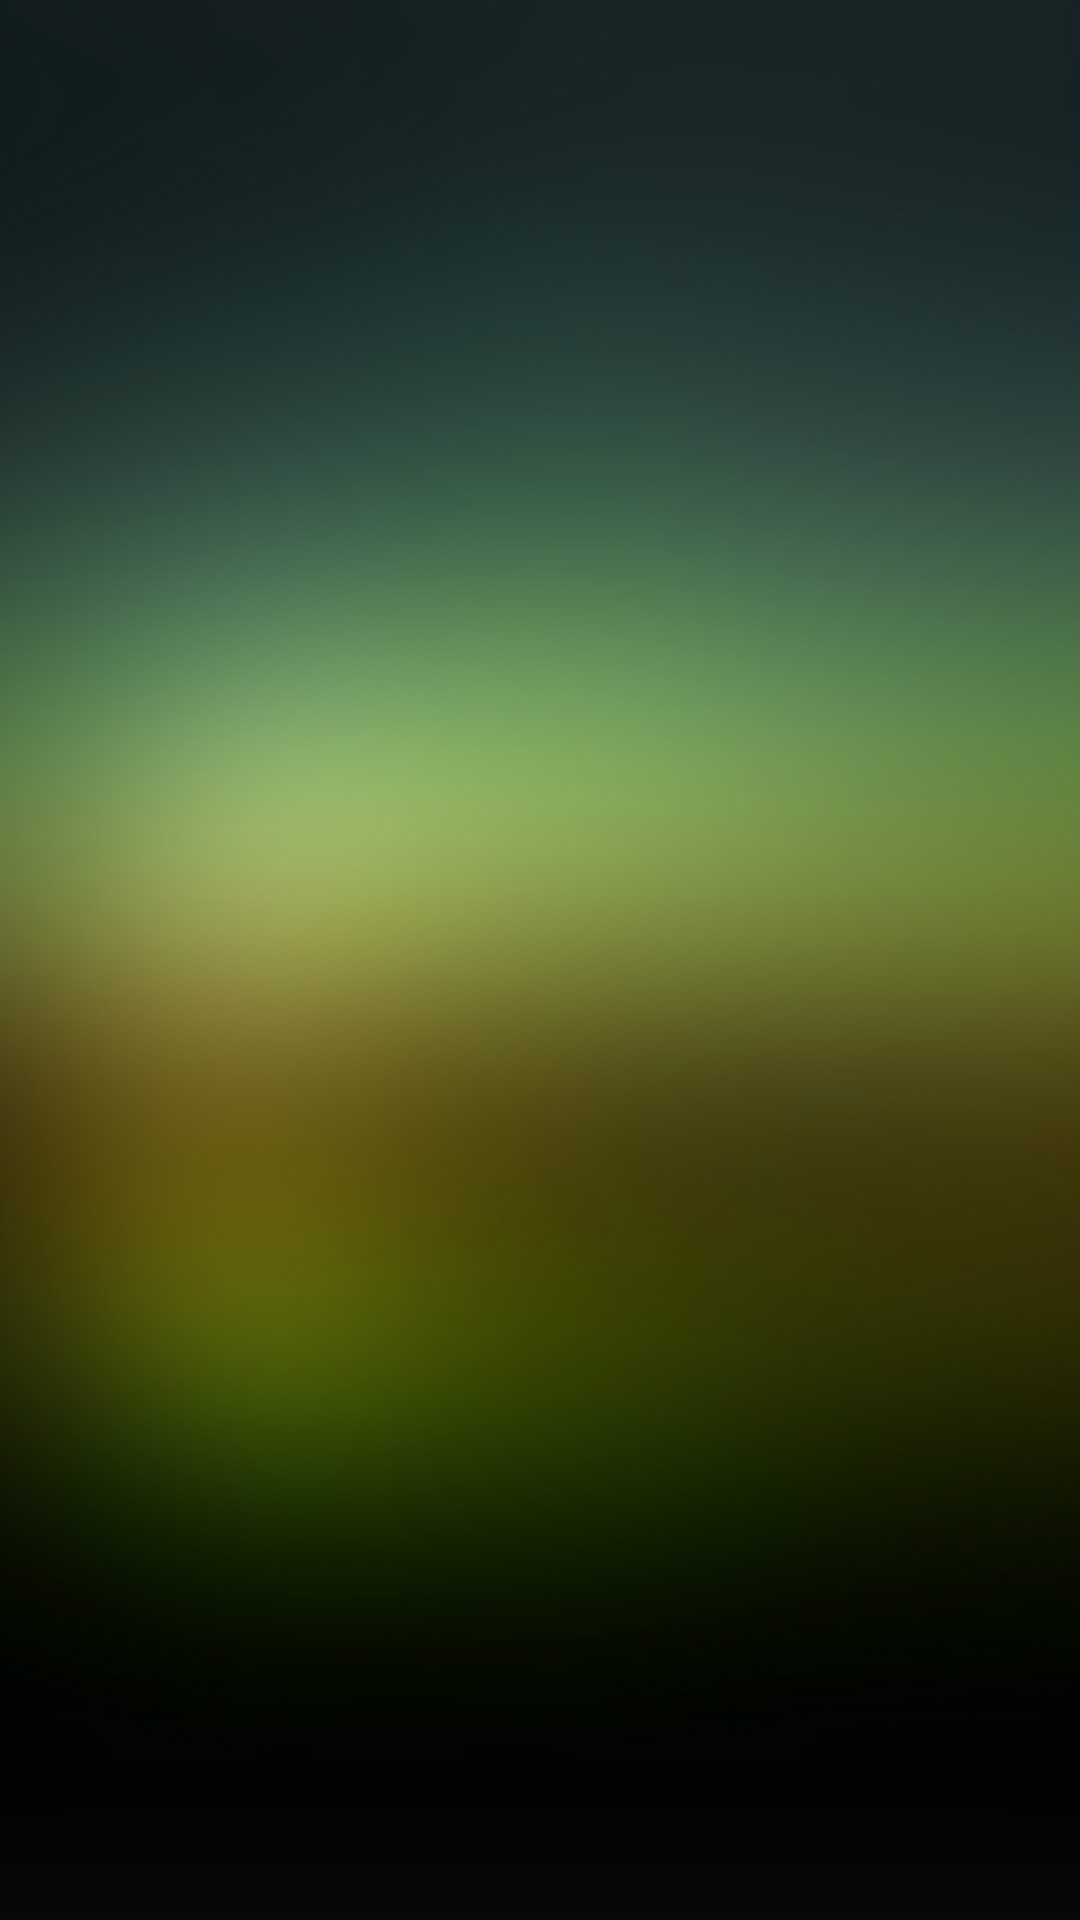 Aurora-Night-Nature-Gradation-Blur-iPhone-wallpaper-wpc5802367